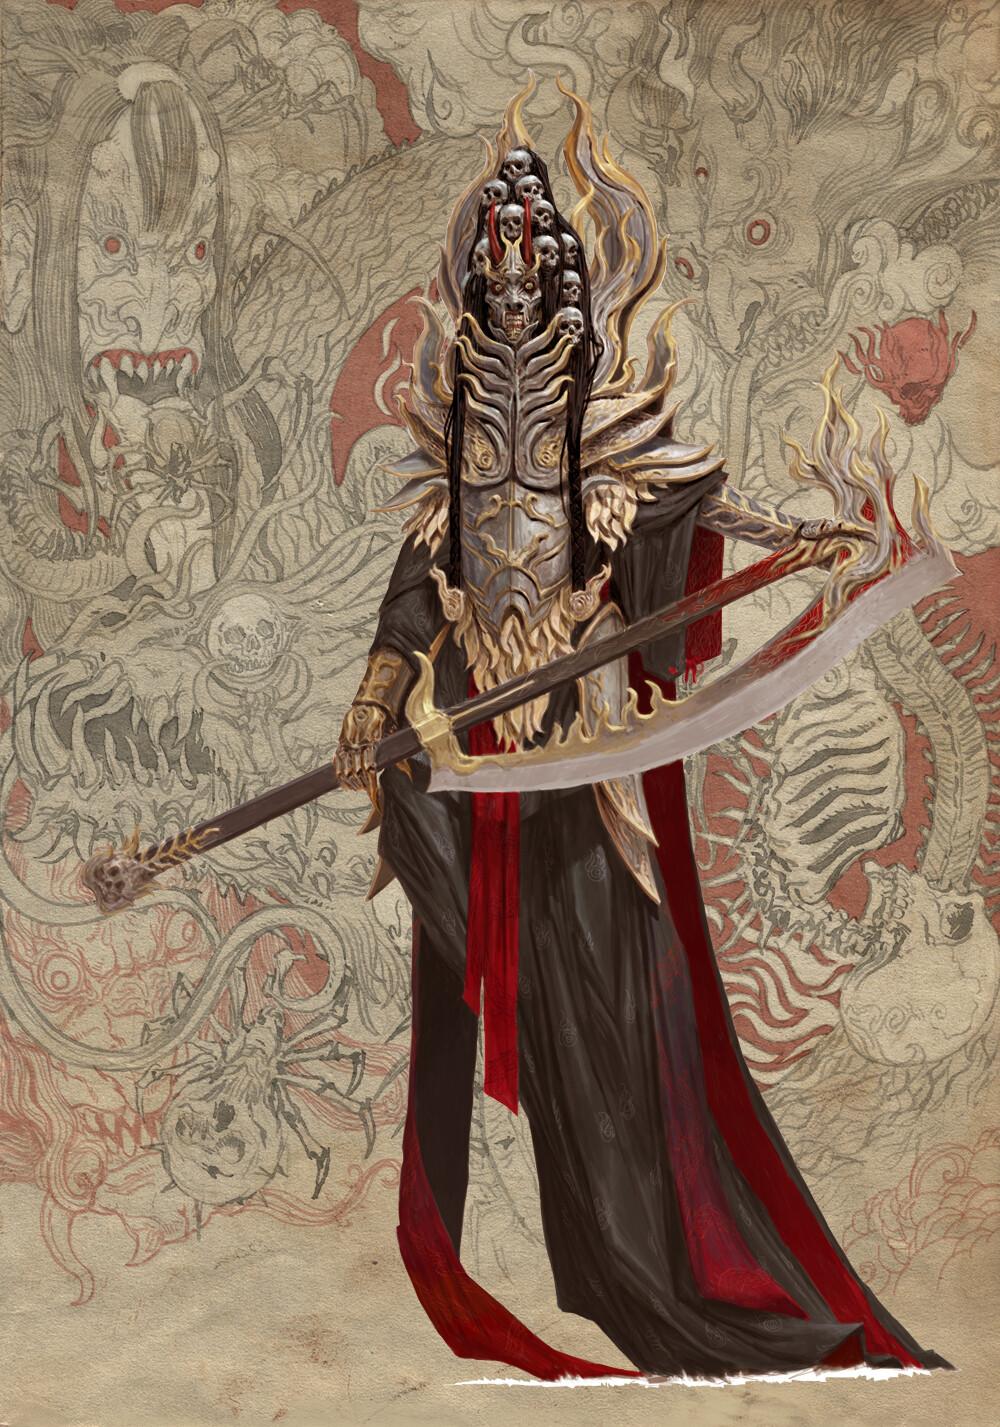 Adrian smith monster demon oni 2